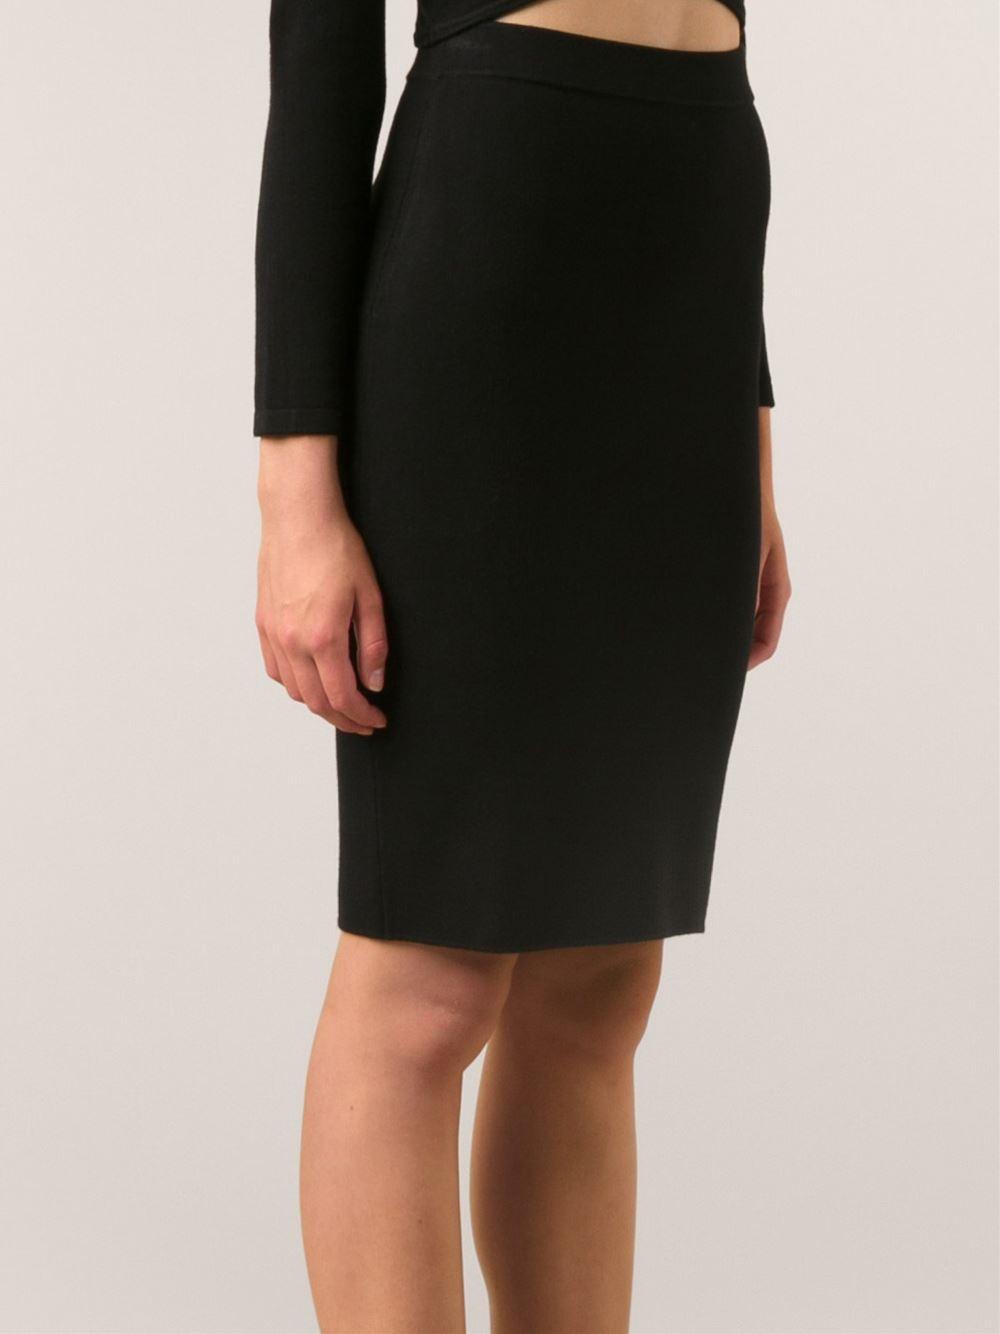 Jonathan simkhai Knit Pencil Skirt in Black | Lyst